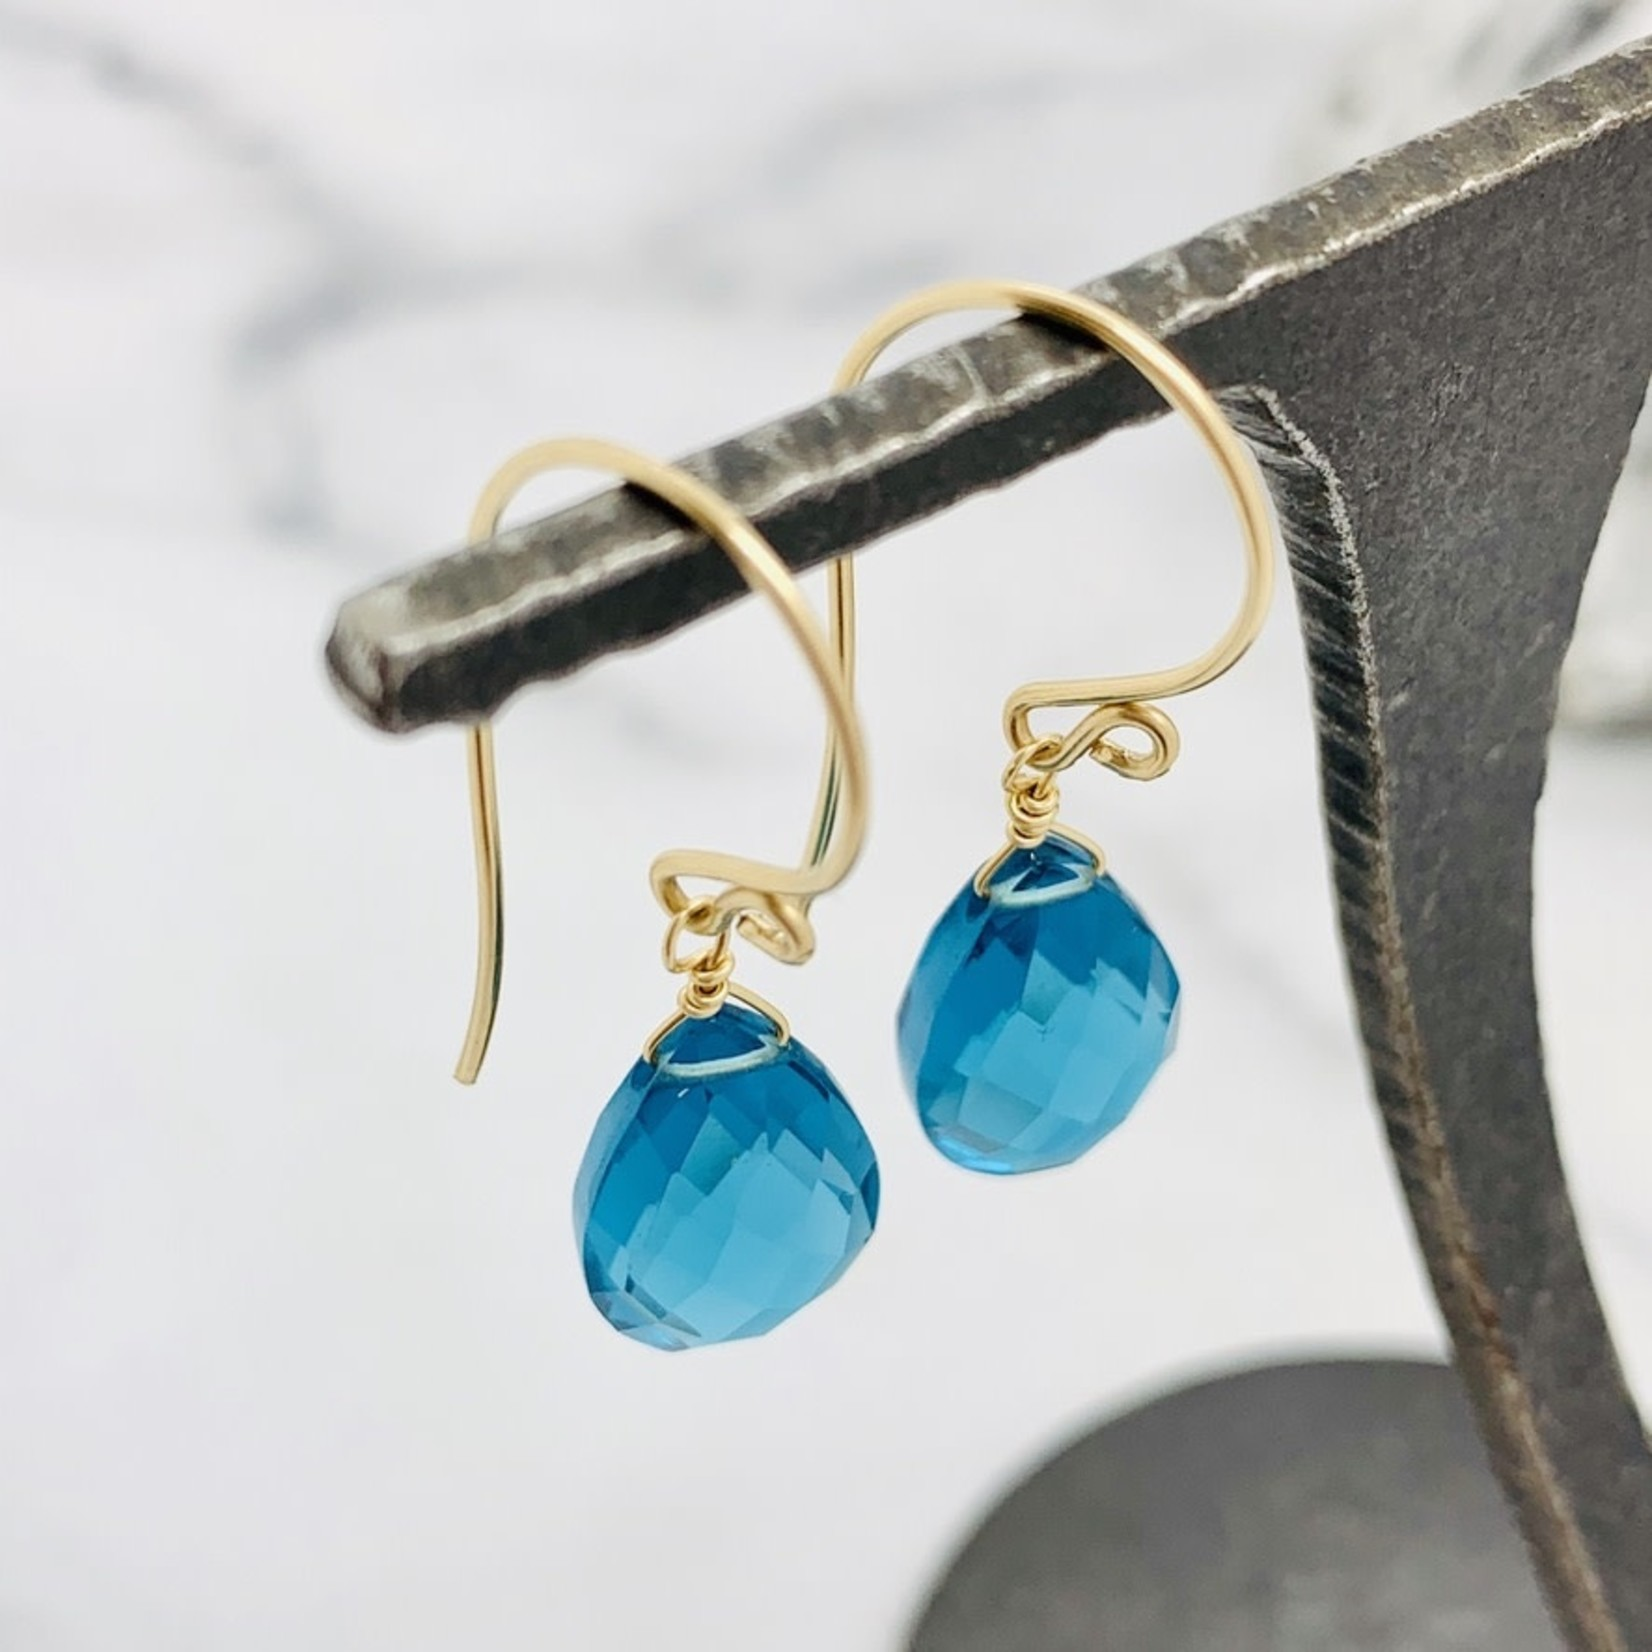 Handmade Faceted Blue Topaz Drop 14k Goldfill Earrings